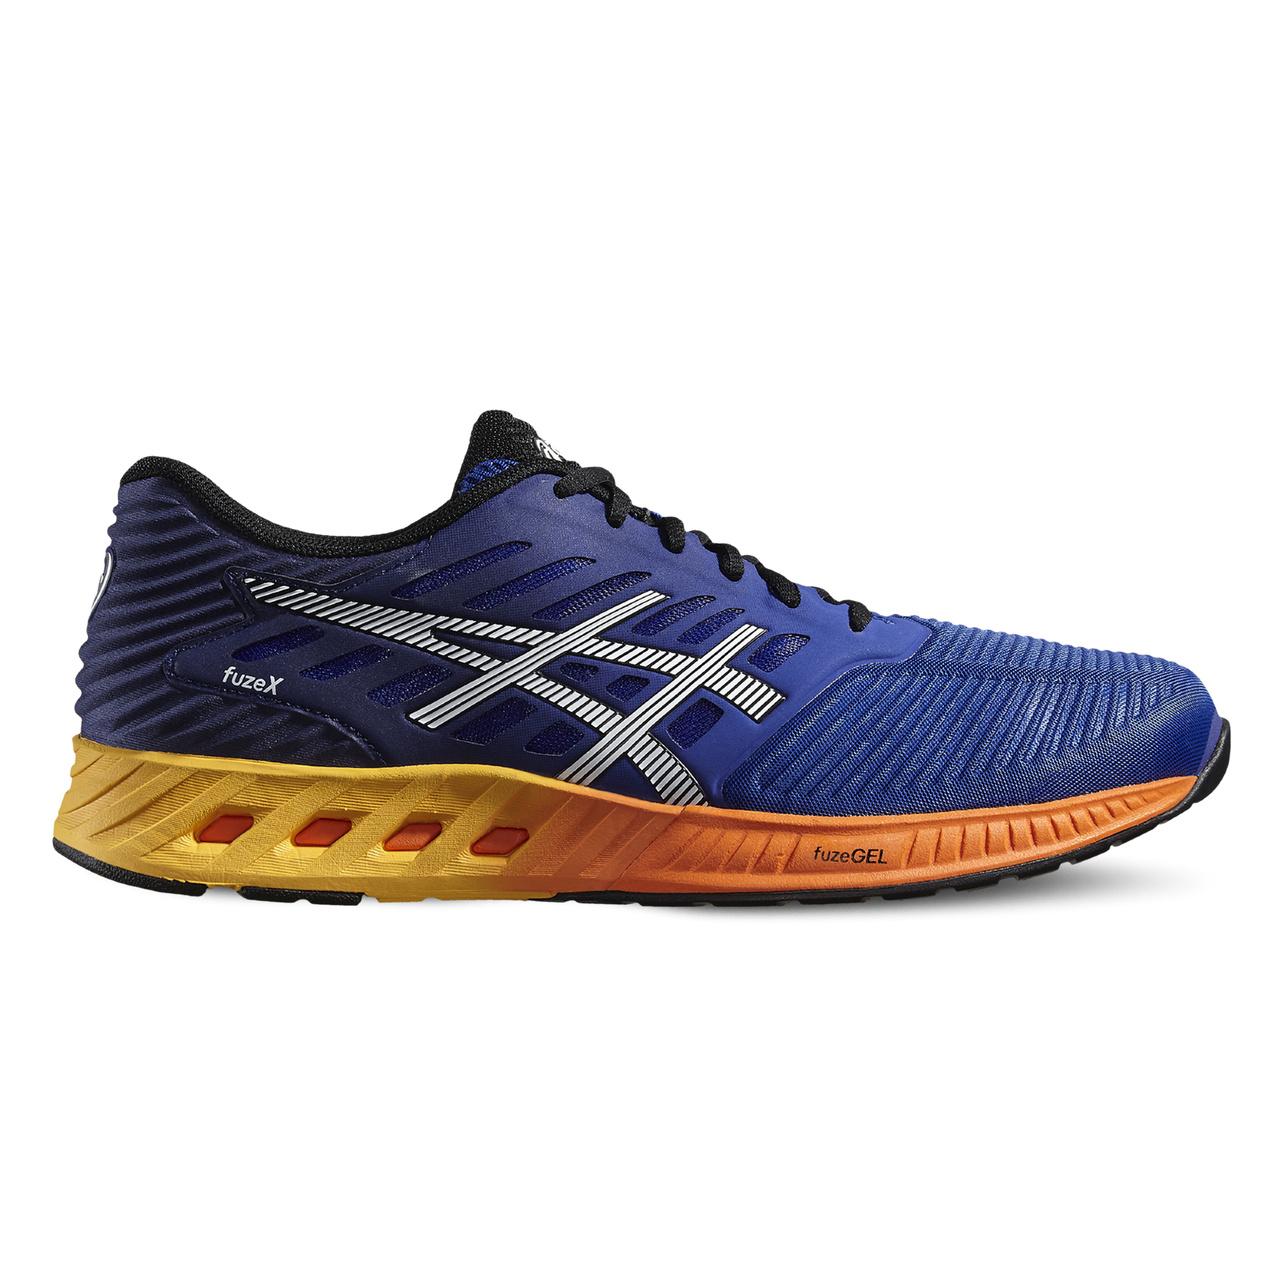 Běžecká obuv pánská